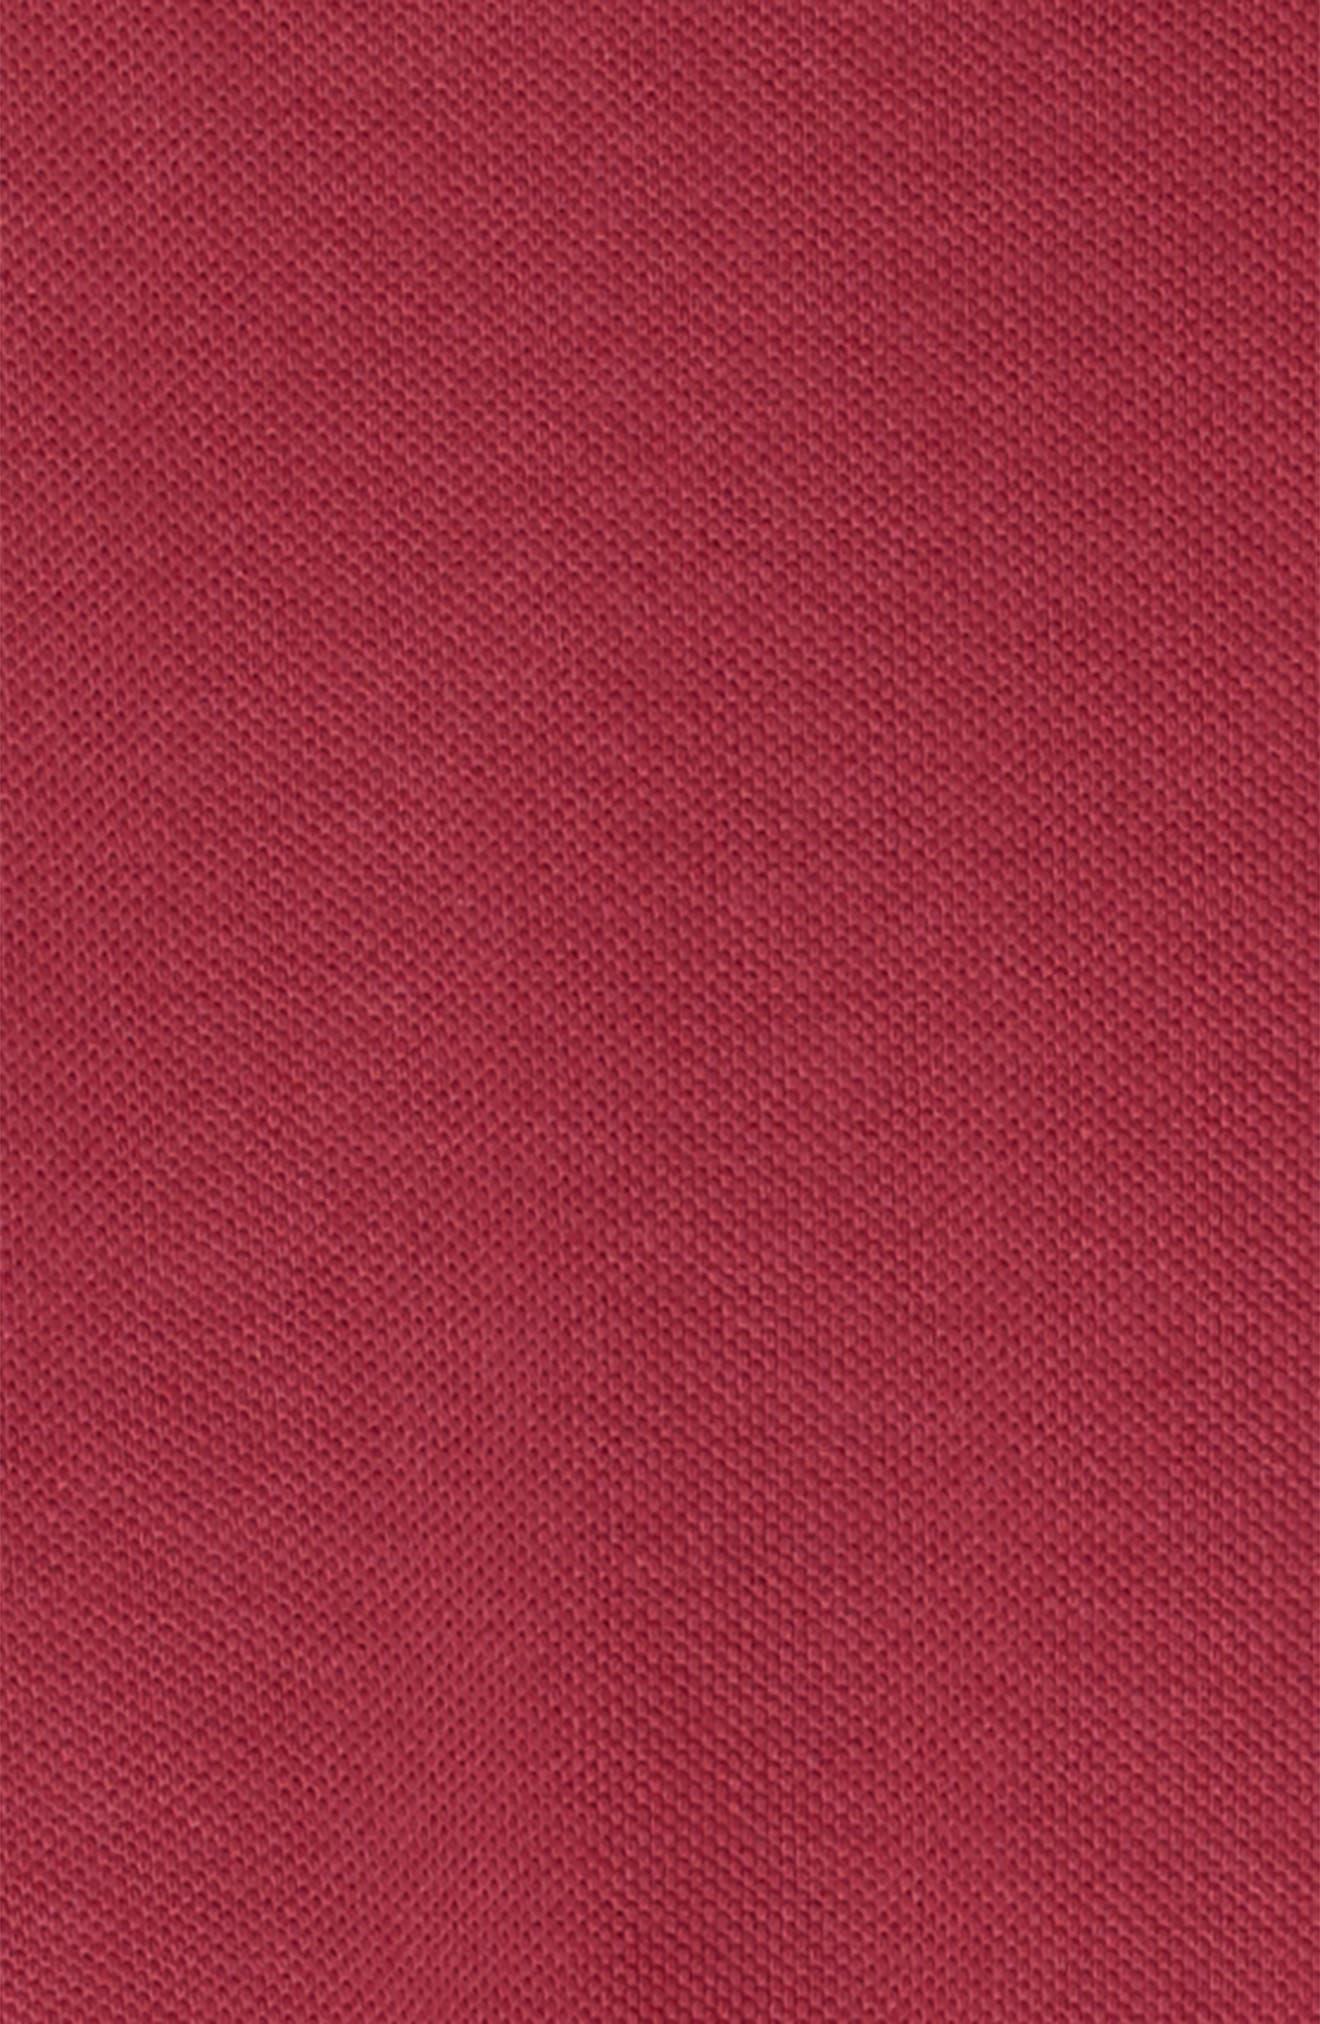 Mini Cali Polo Dress,                             Alternate thumbnail 3, color,                             Garnet Pink